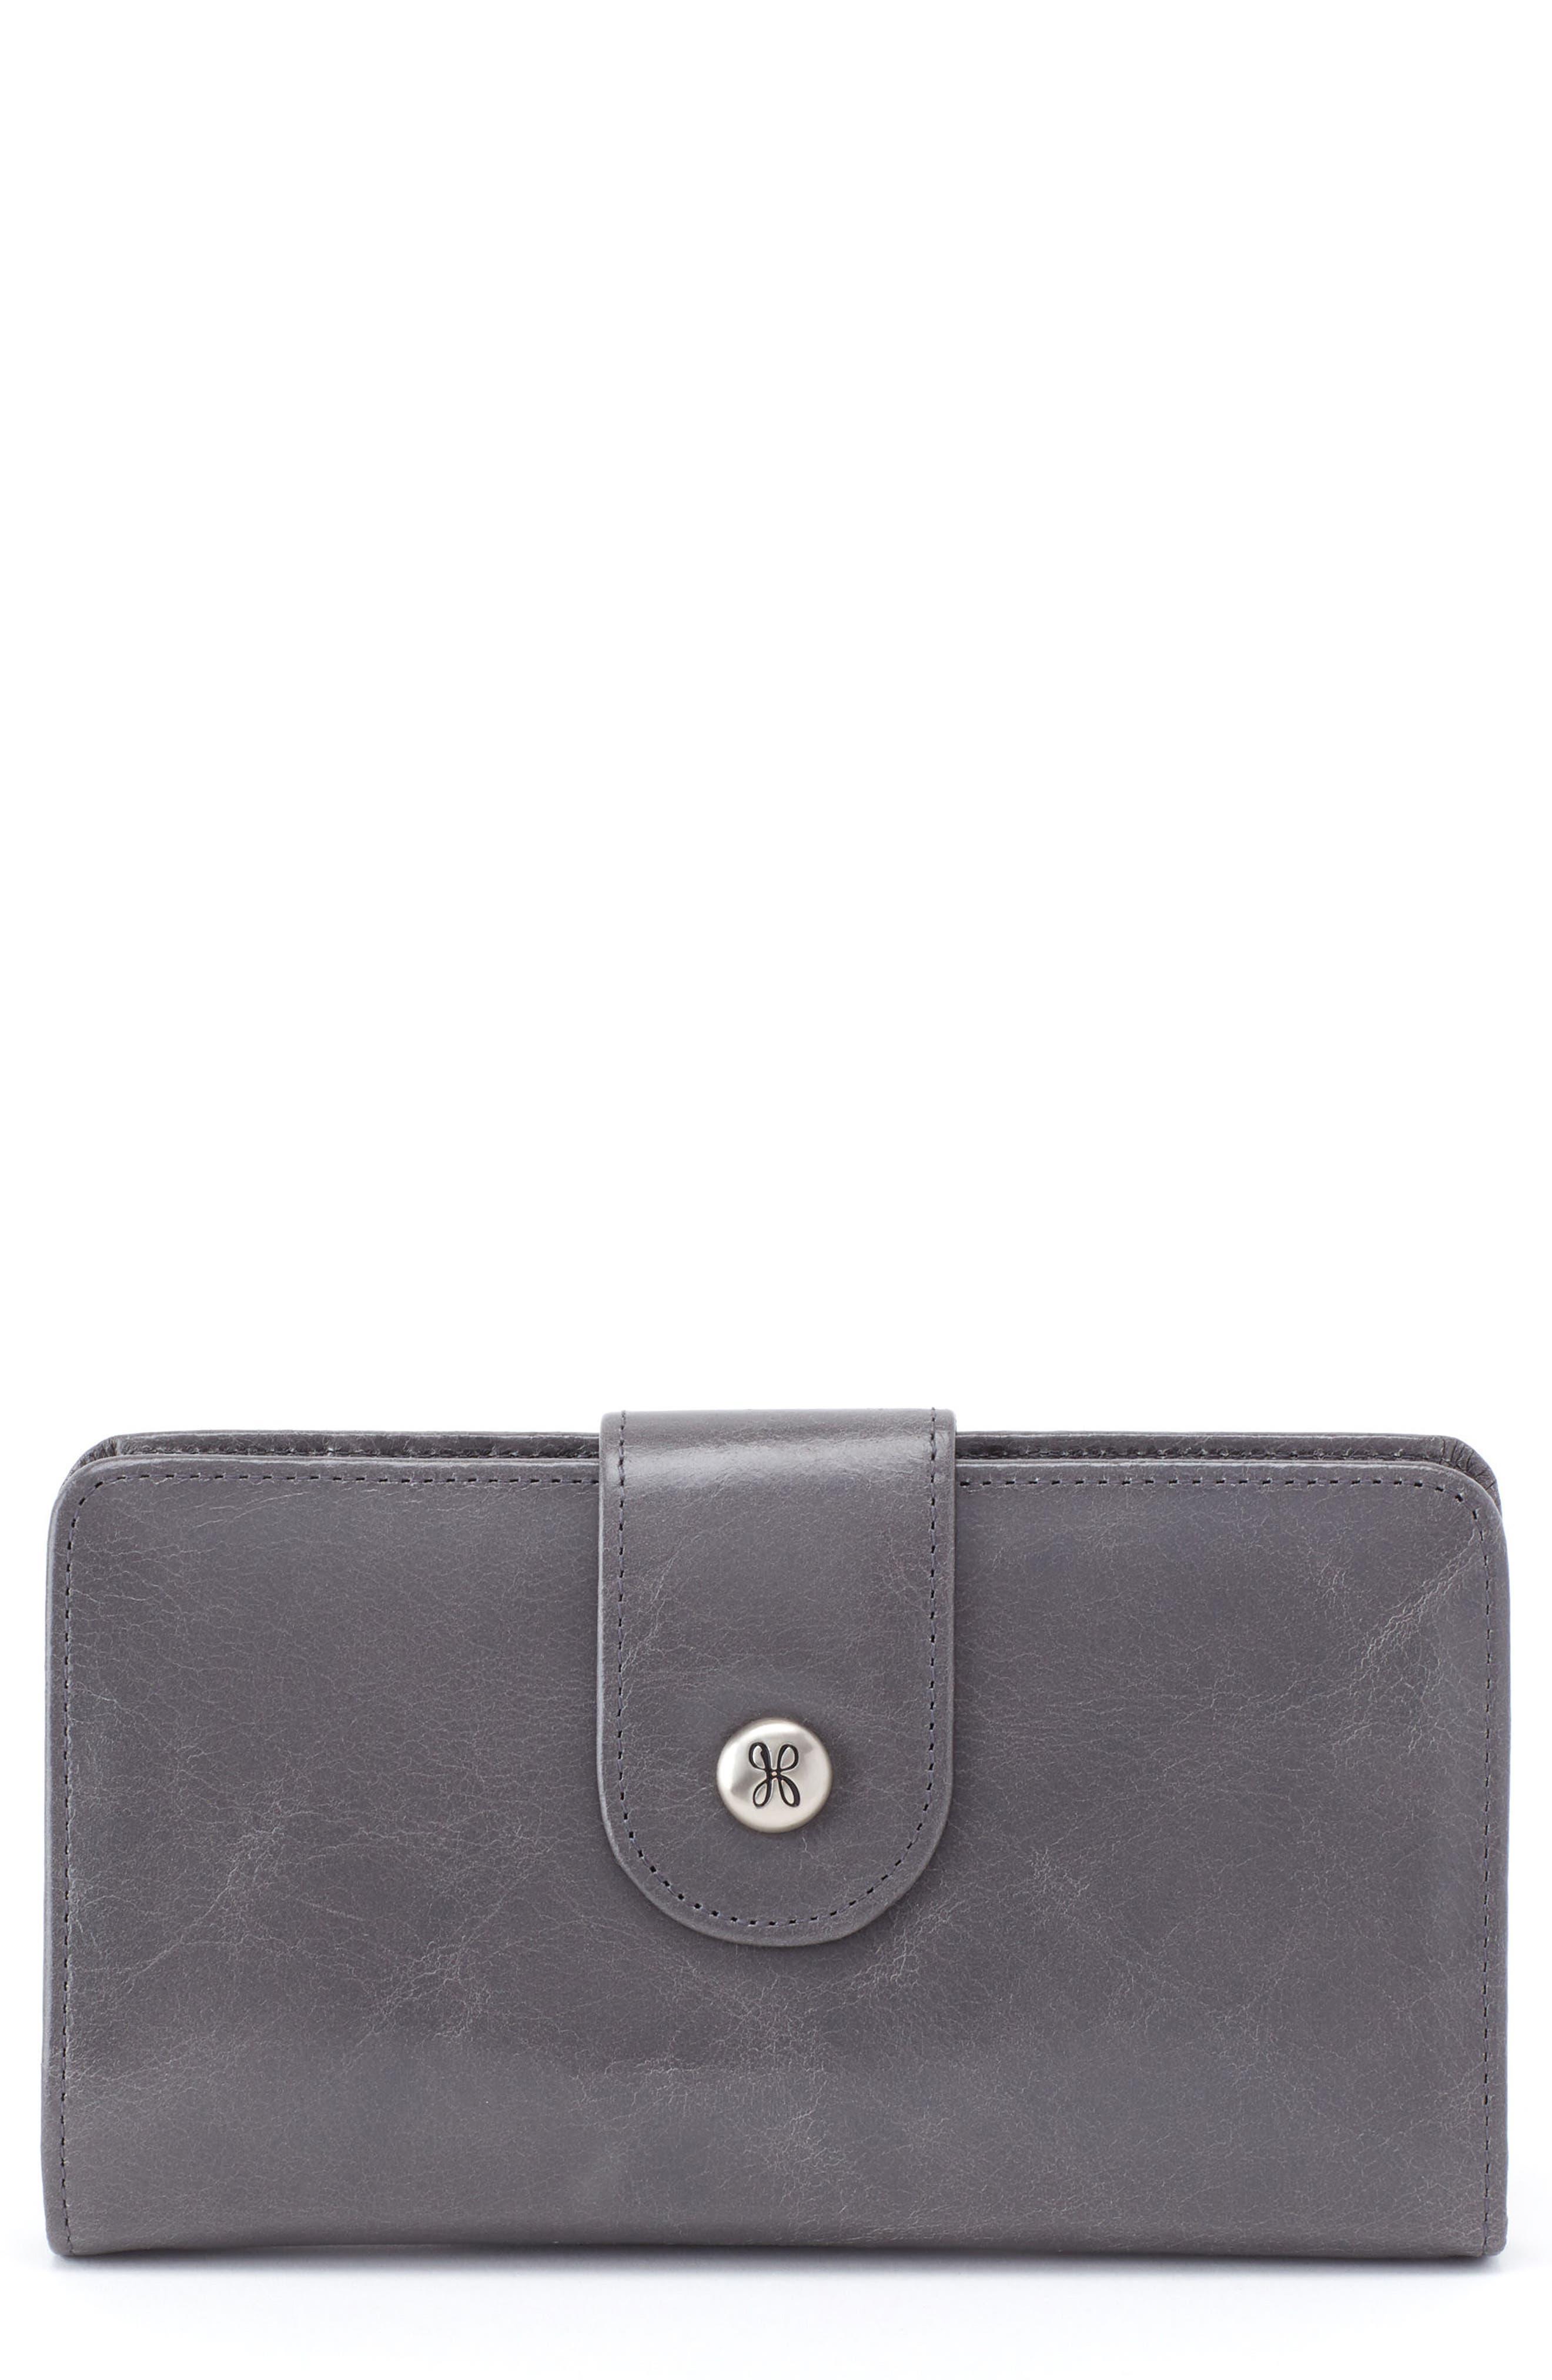 Danette Glazed Continental Wallet,                             Main thumbnail 1, color,                             025